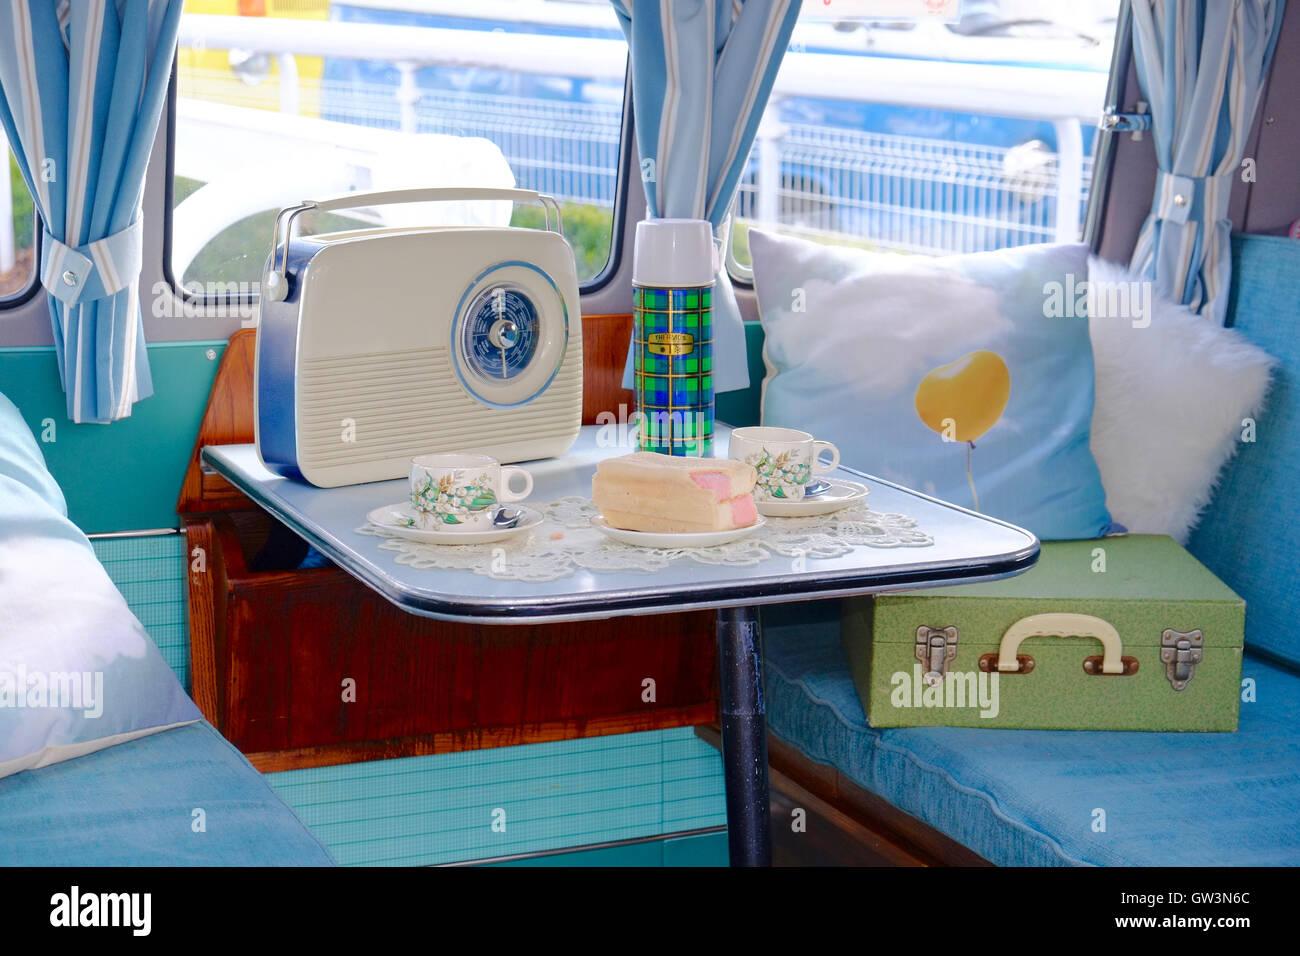 Volkswagen Camper-van Interior, set for afternoon tea and cake. - Stock Image